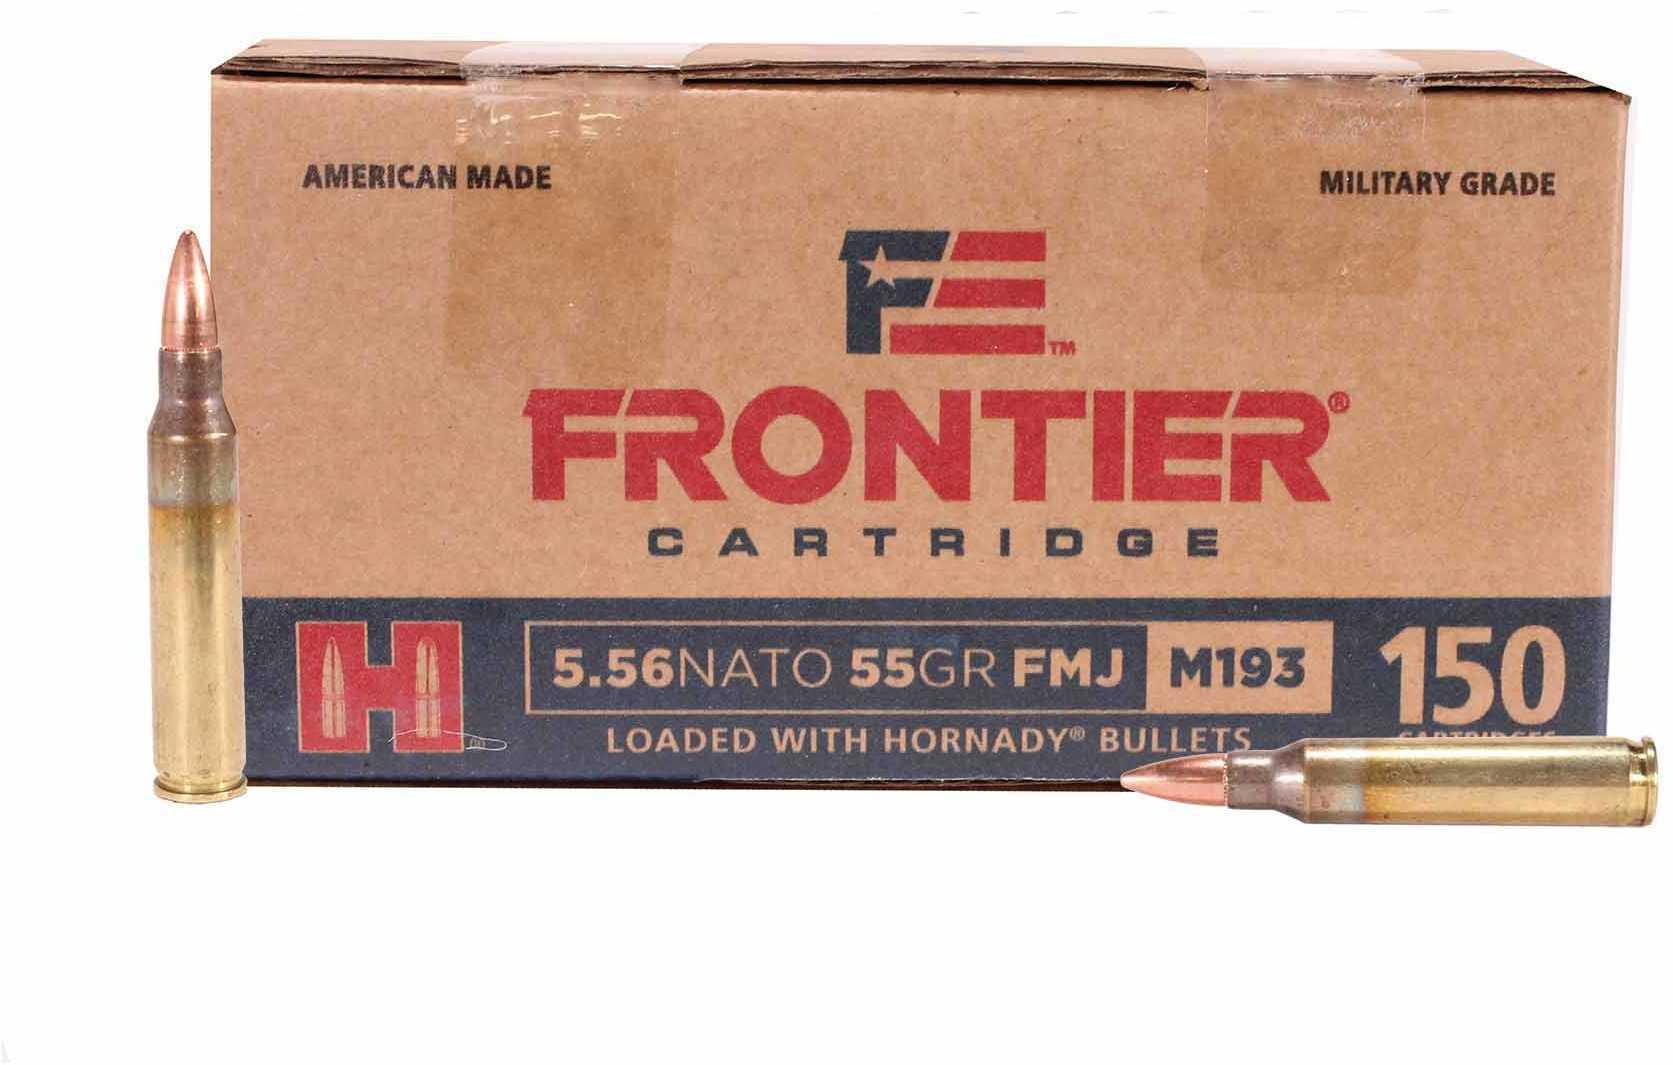 Hornady 5.56x45mm NATO Frontier Cartridge Military Grade, 55 Grains, Full Metal Jacket, Per 150 Md: FR202